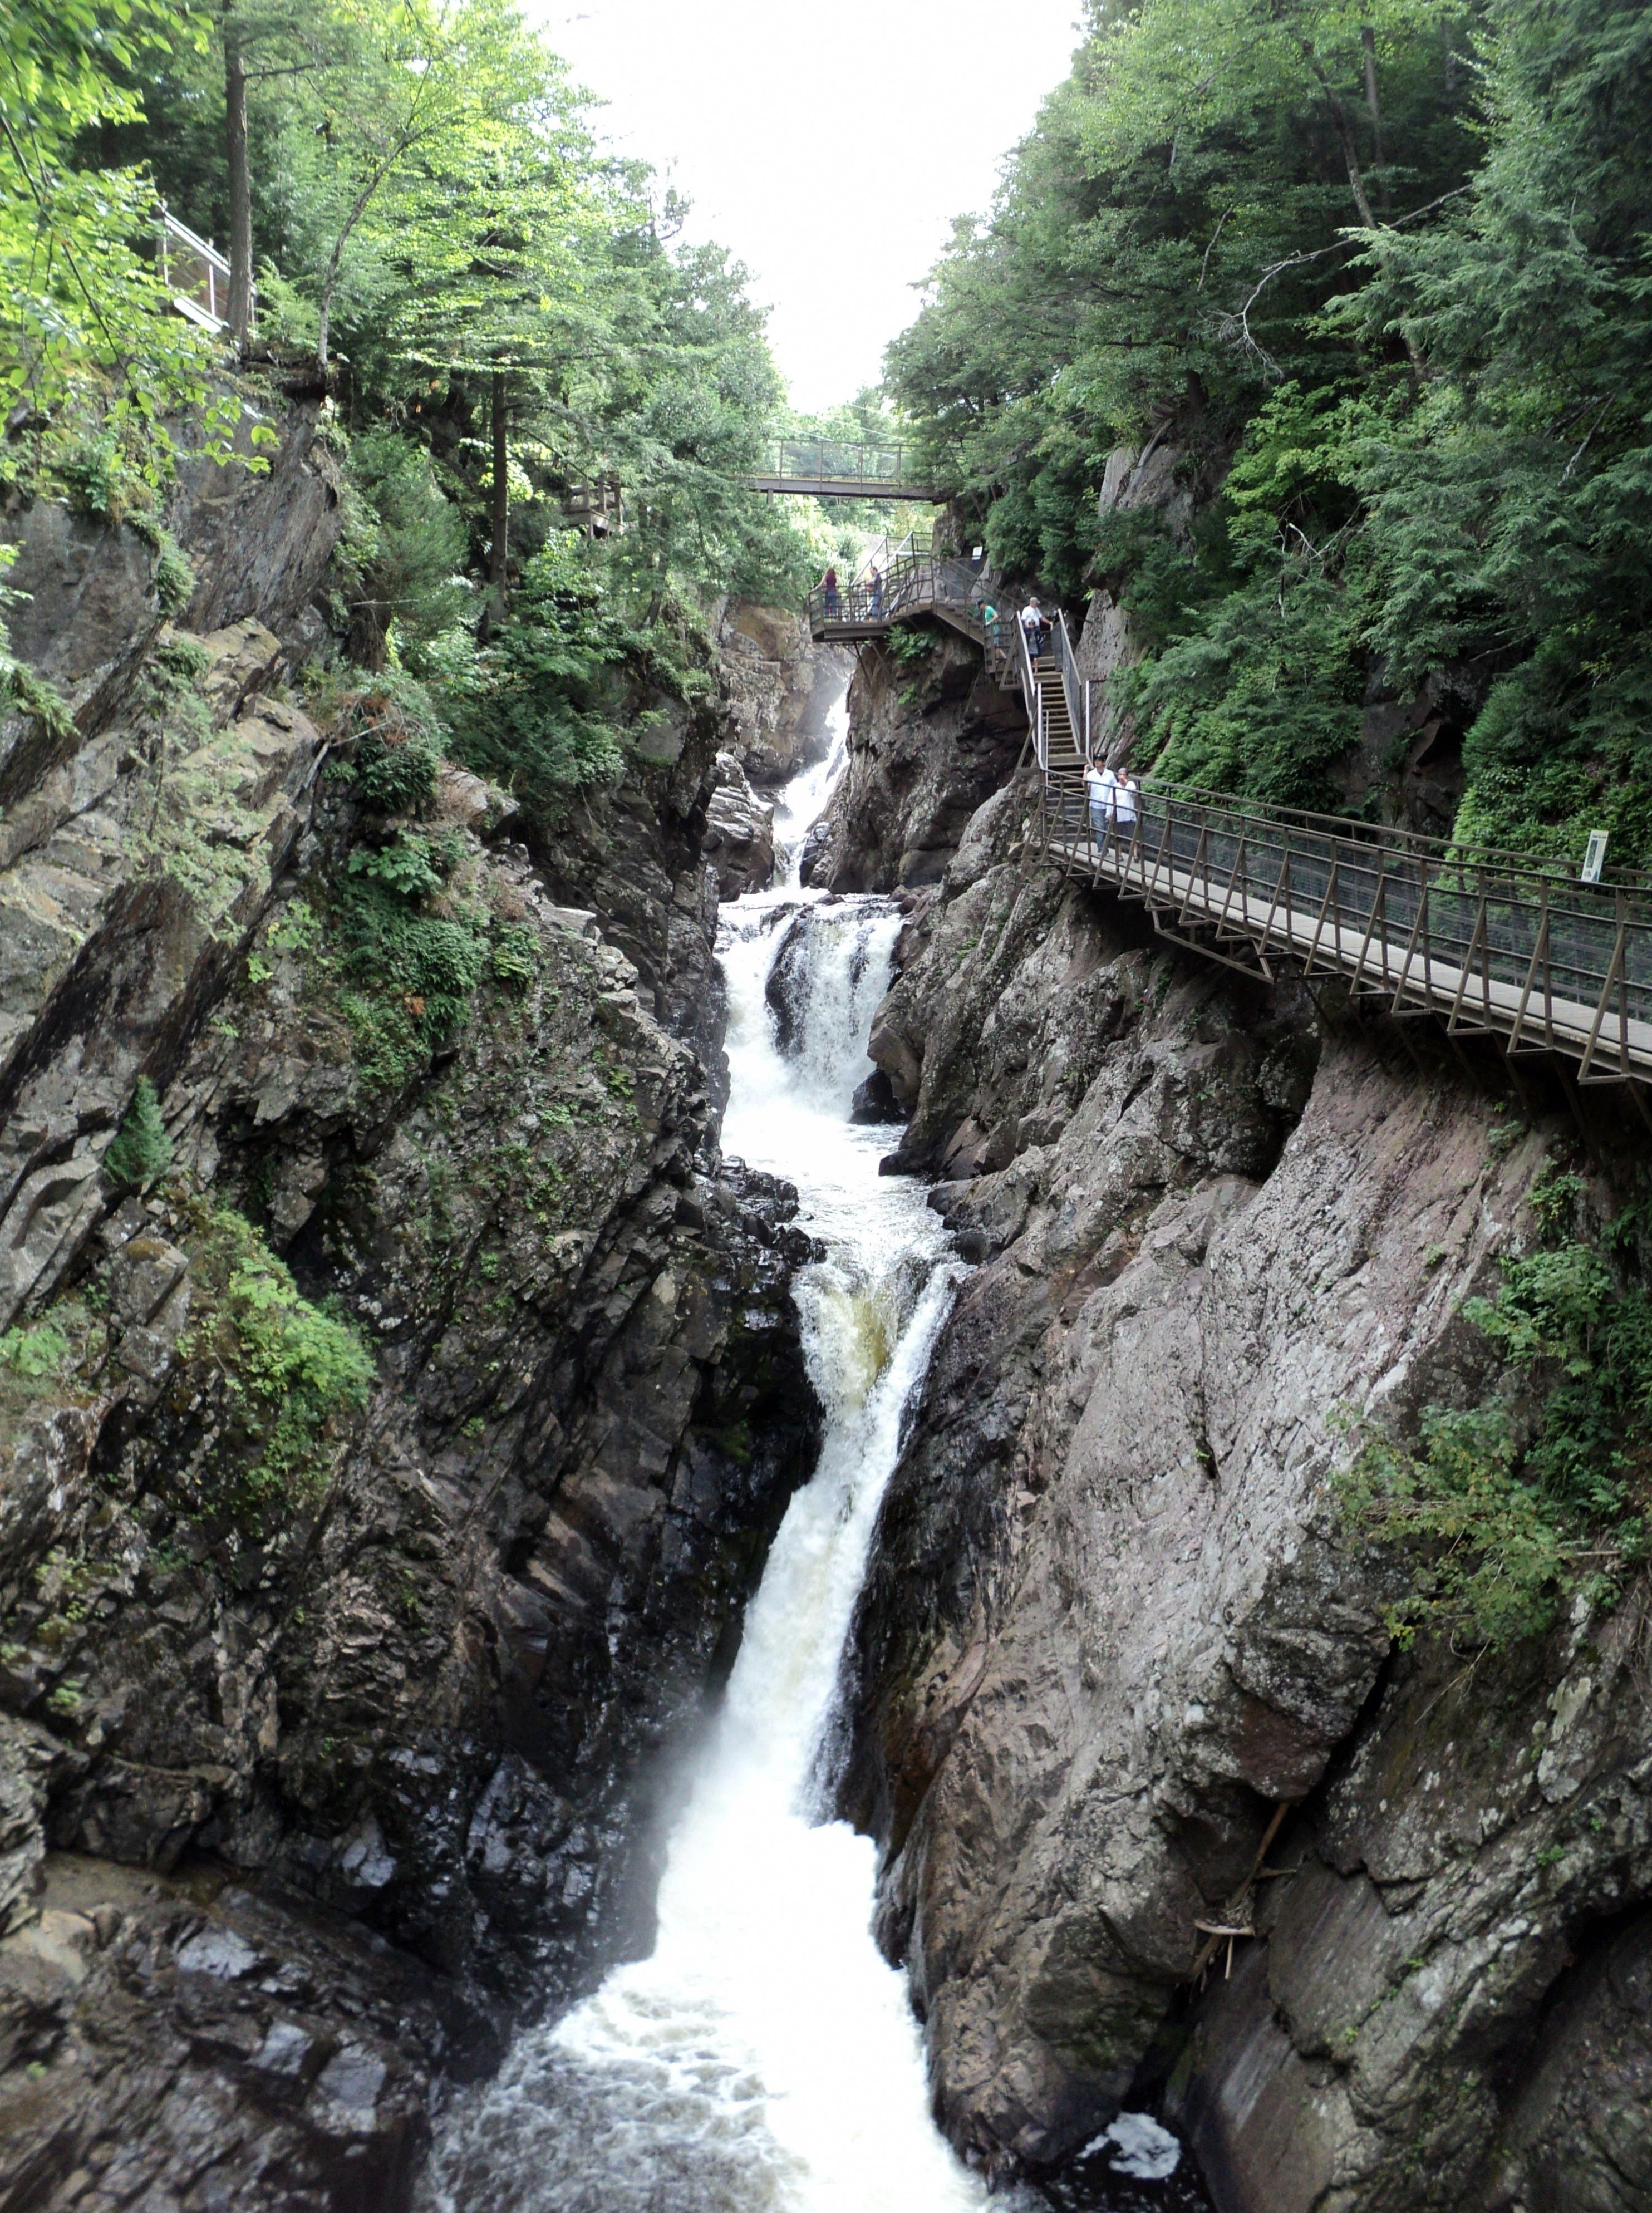 Water going down at Adirondack Mountains, New York image